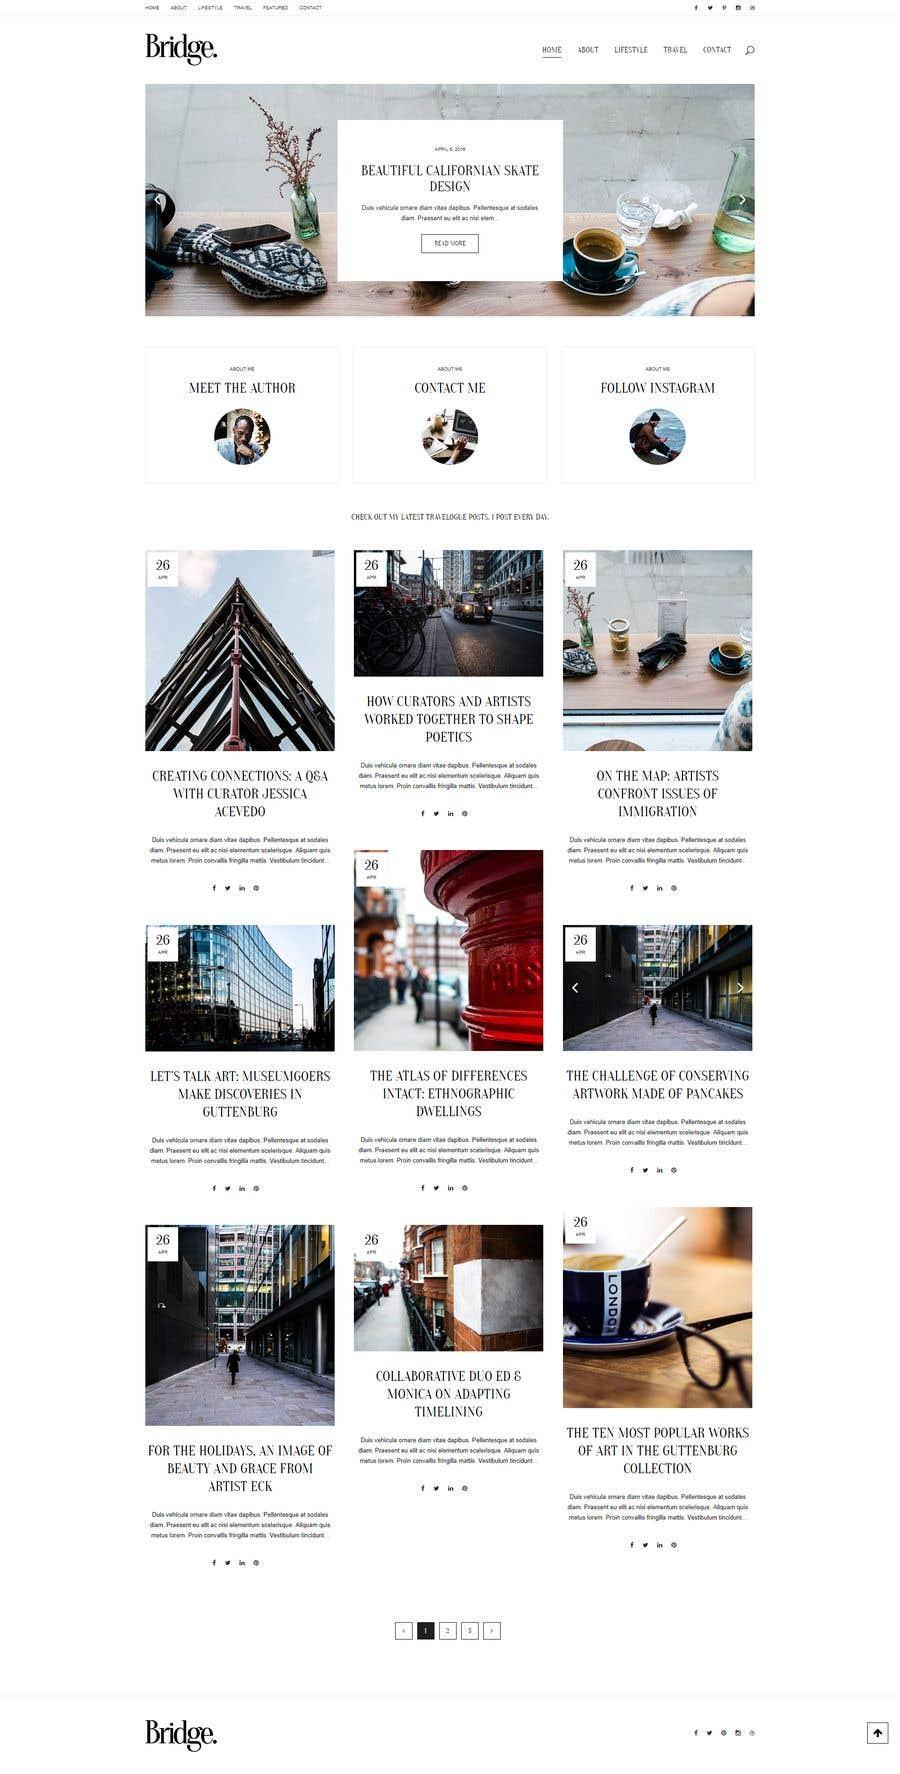 Konkurrenceindlæg #12 for Build A Blog - Design a Brand